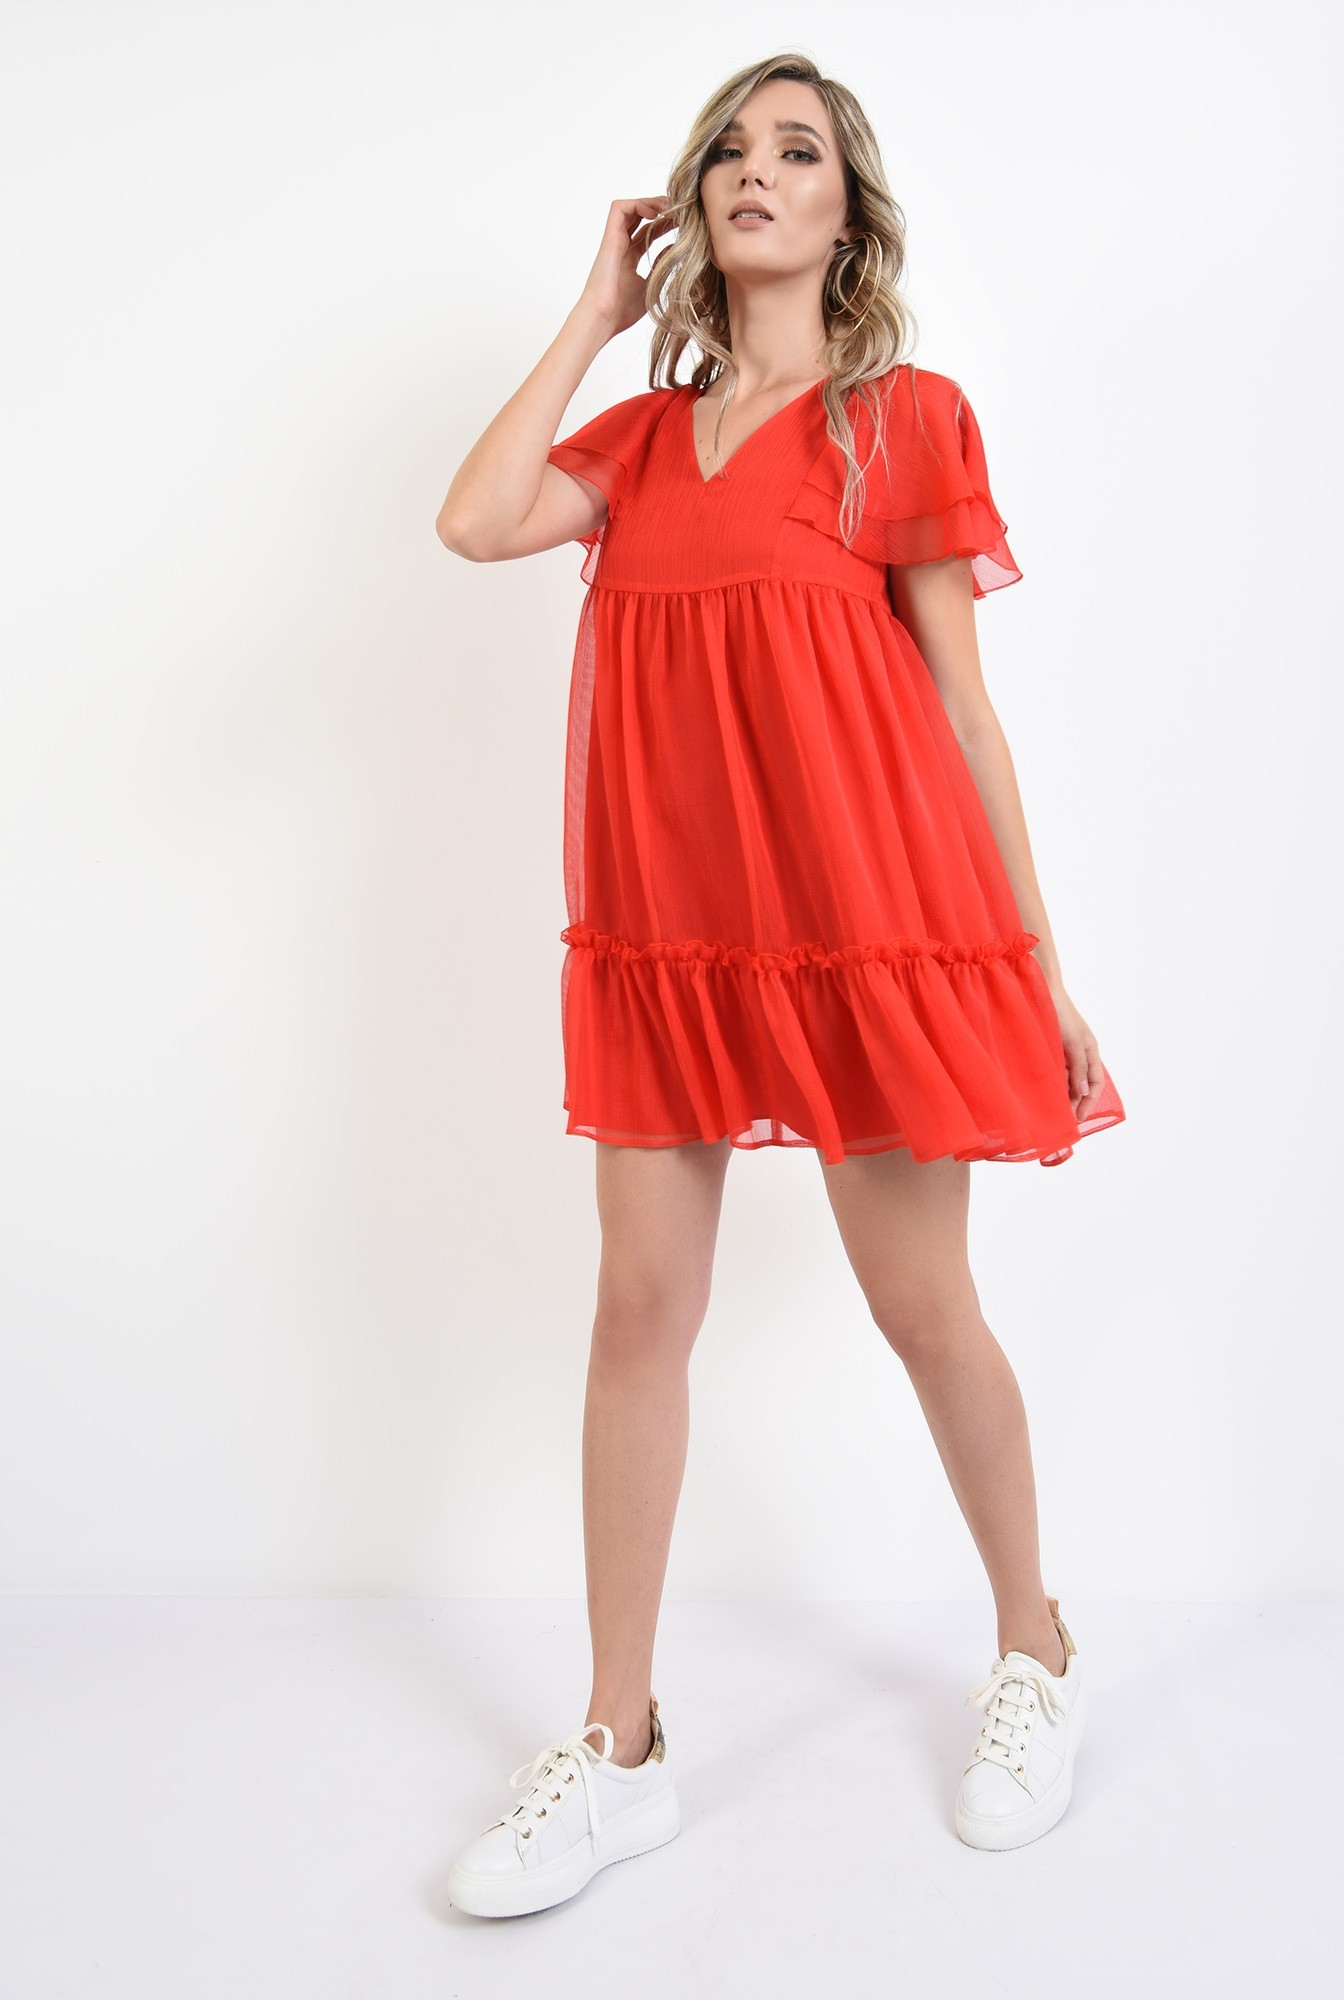 0 - 360 - rochie scurta, de vara, rosie, cu volane, Poema